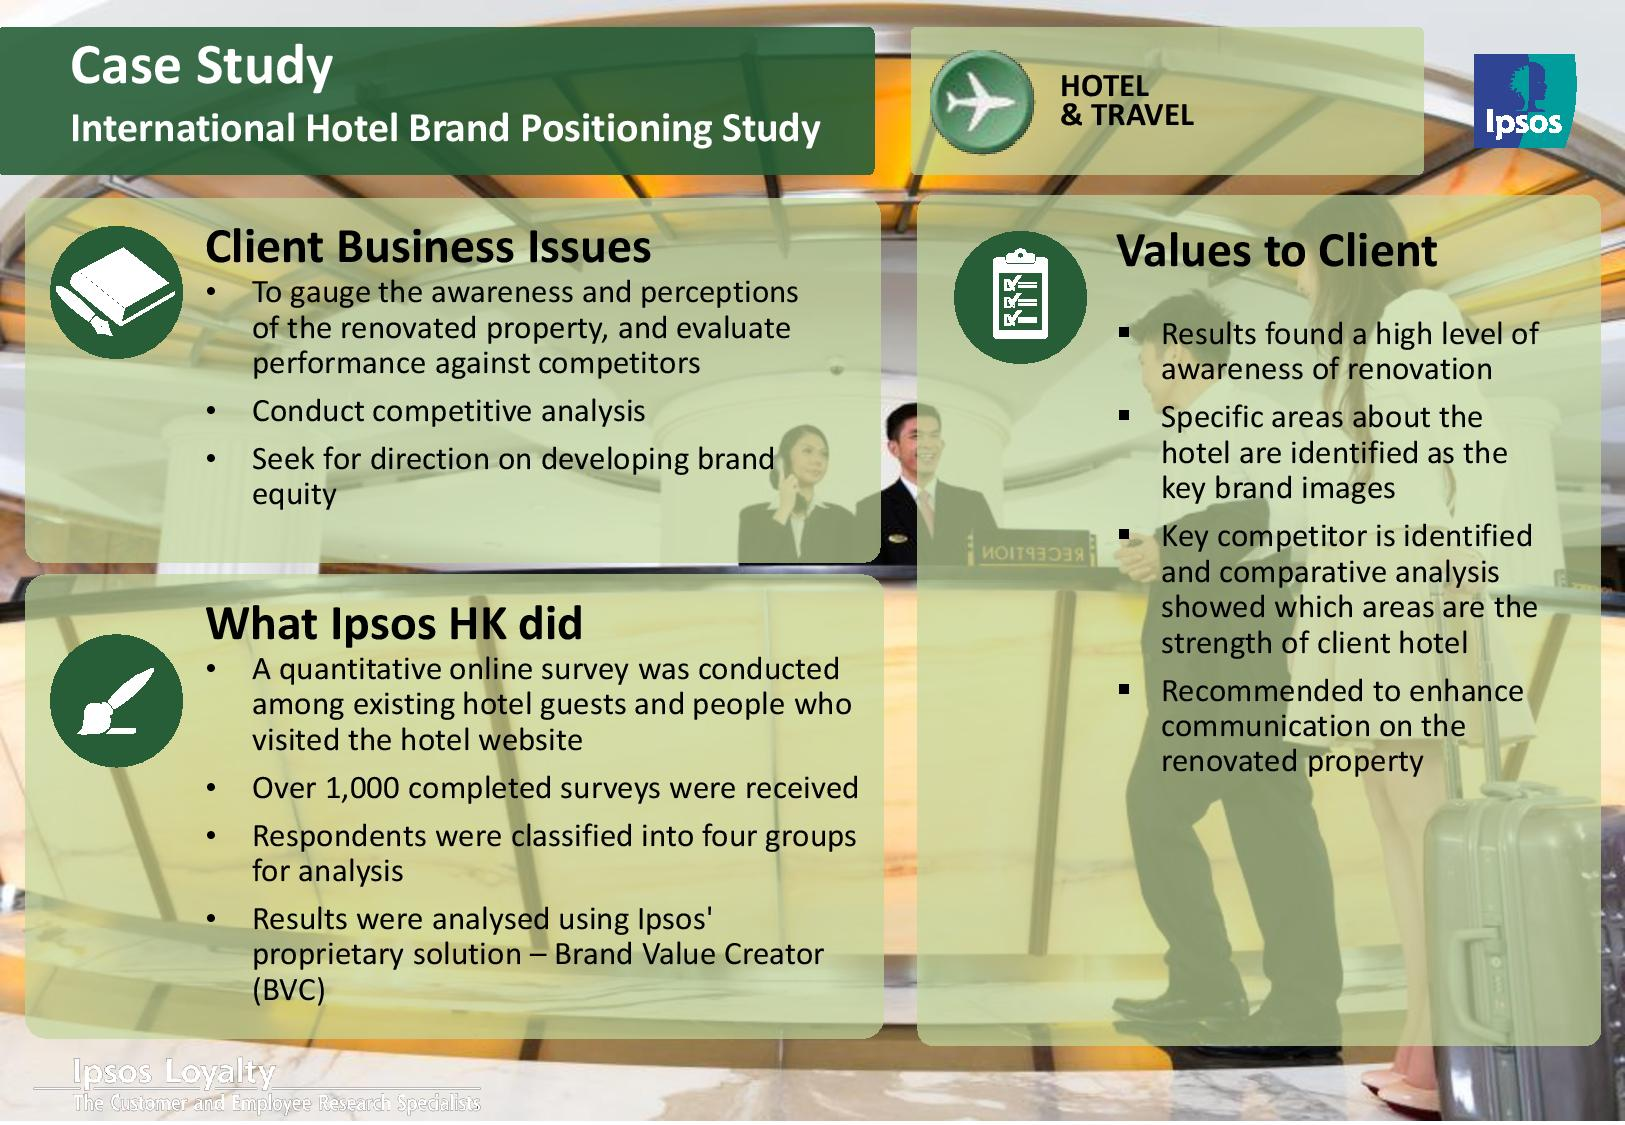 a86a119bf90 Case Study - International Hotel Brand Positioning Study | Ipsos